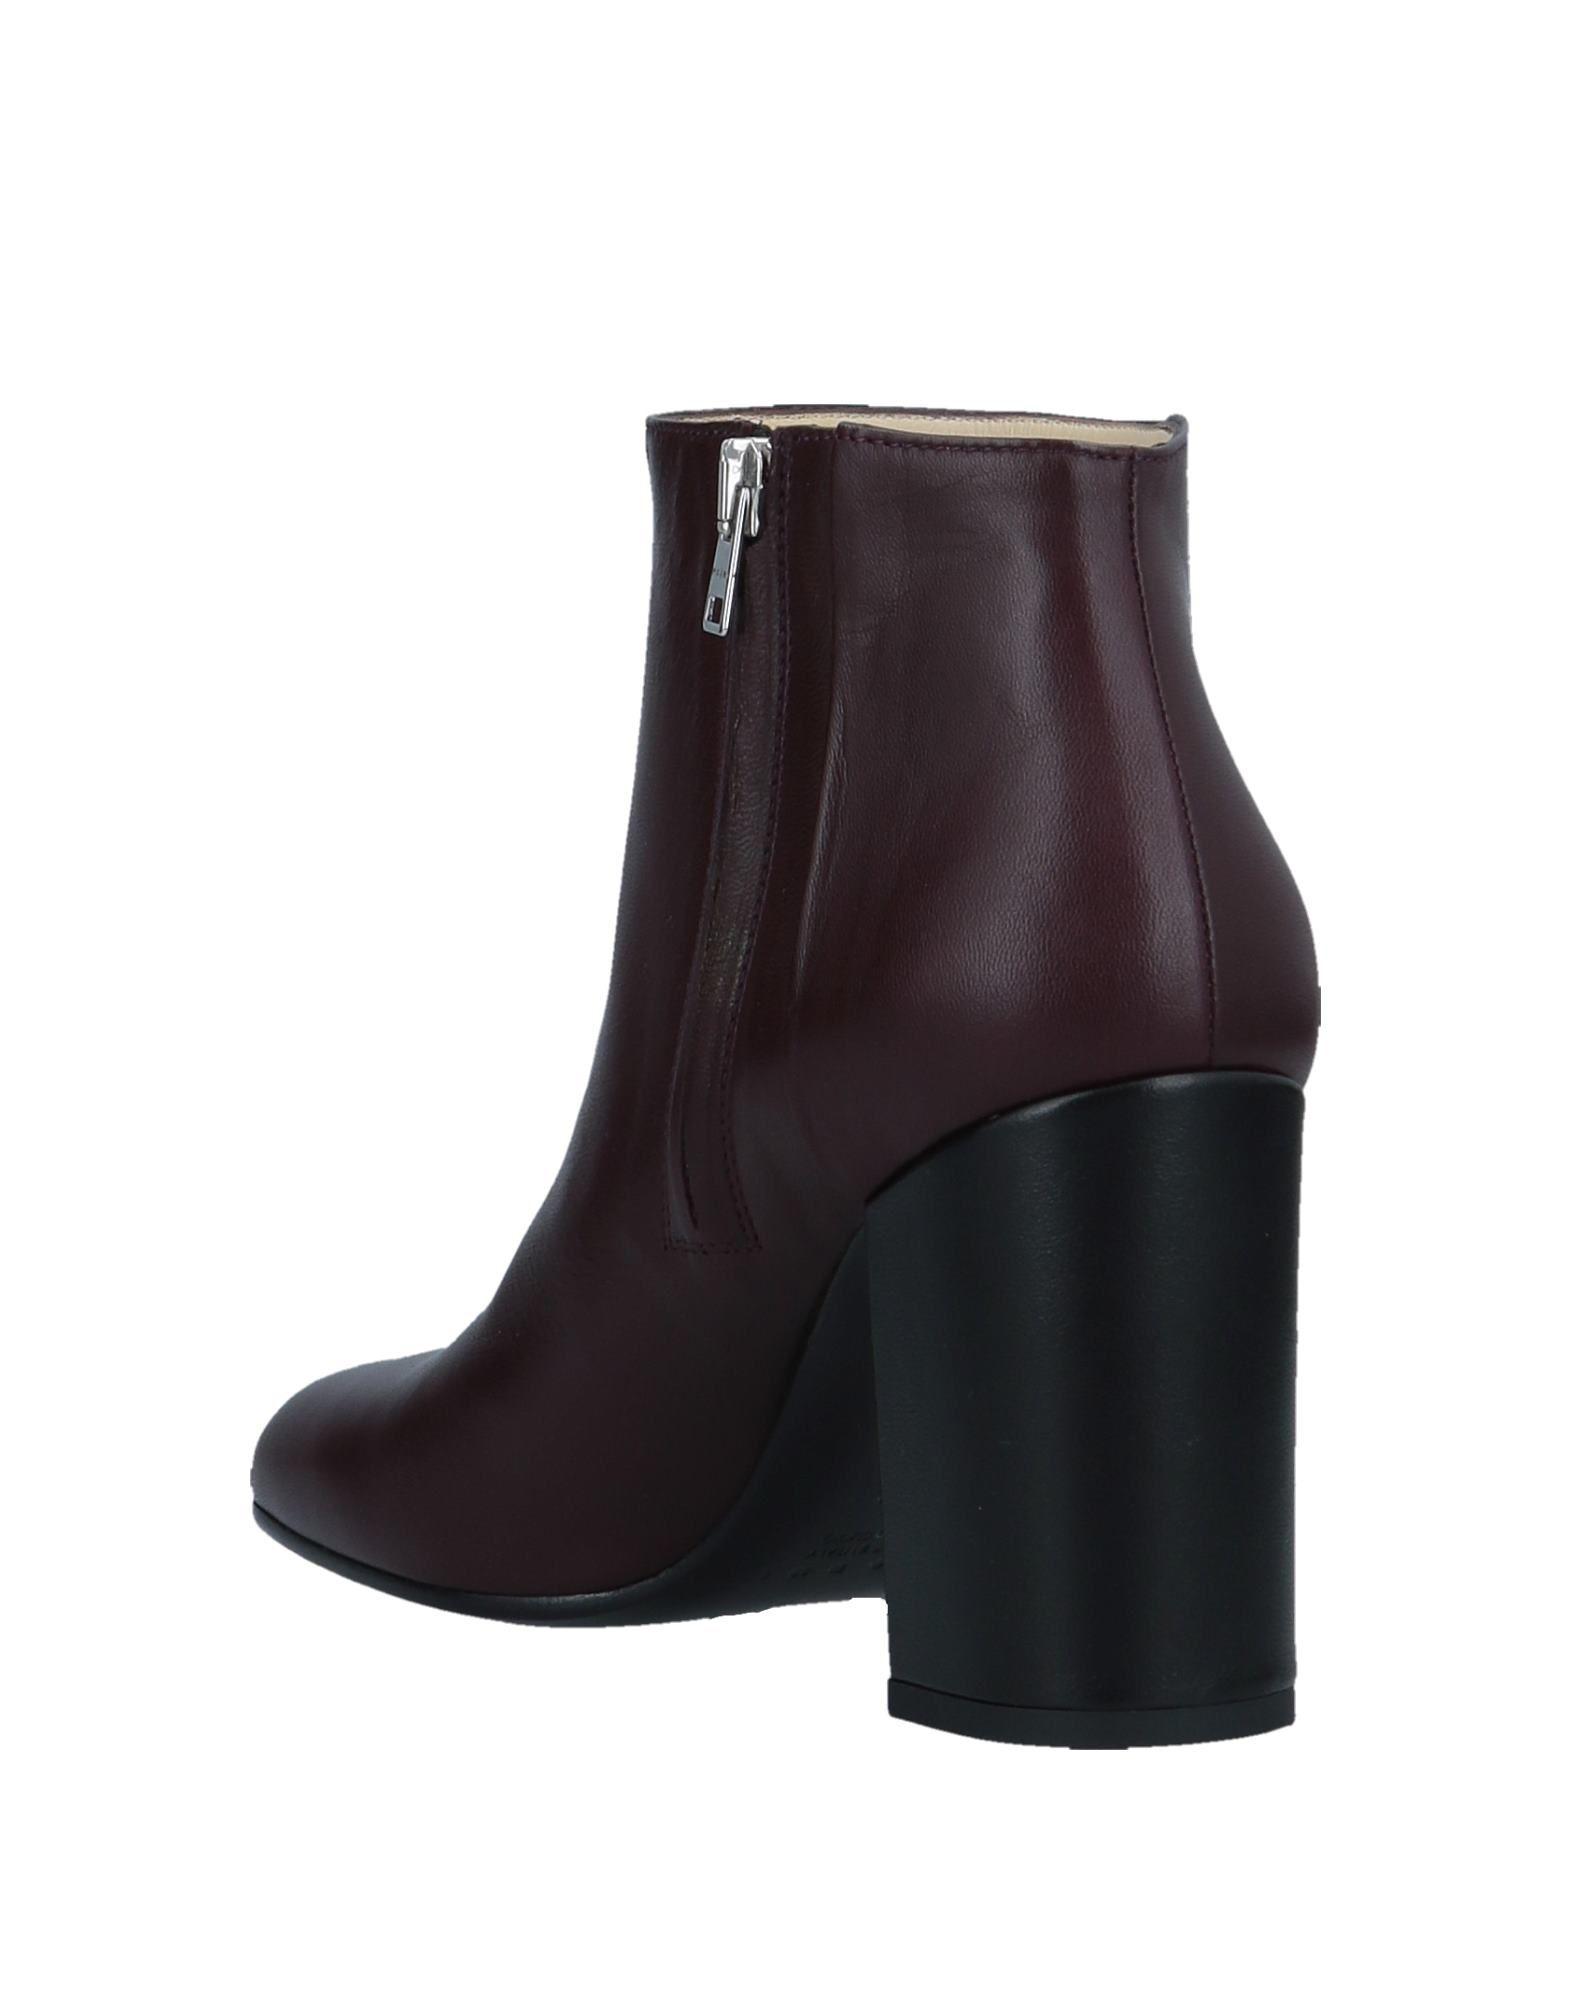 Marni Ankle Boot Boot Boot - Women Marni Ankle Boots online on  United Kingdom - 11548900ES 499318